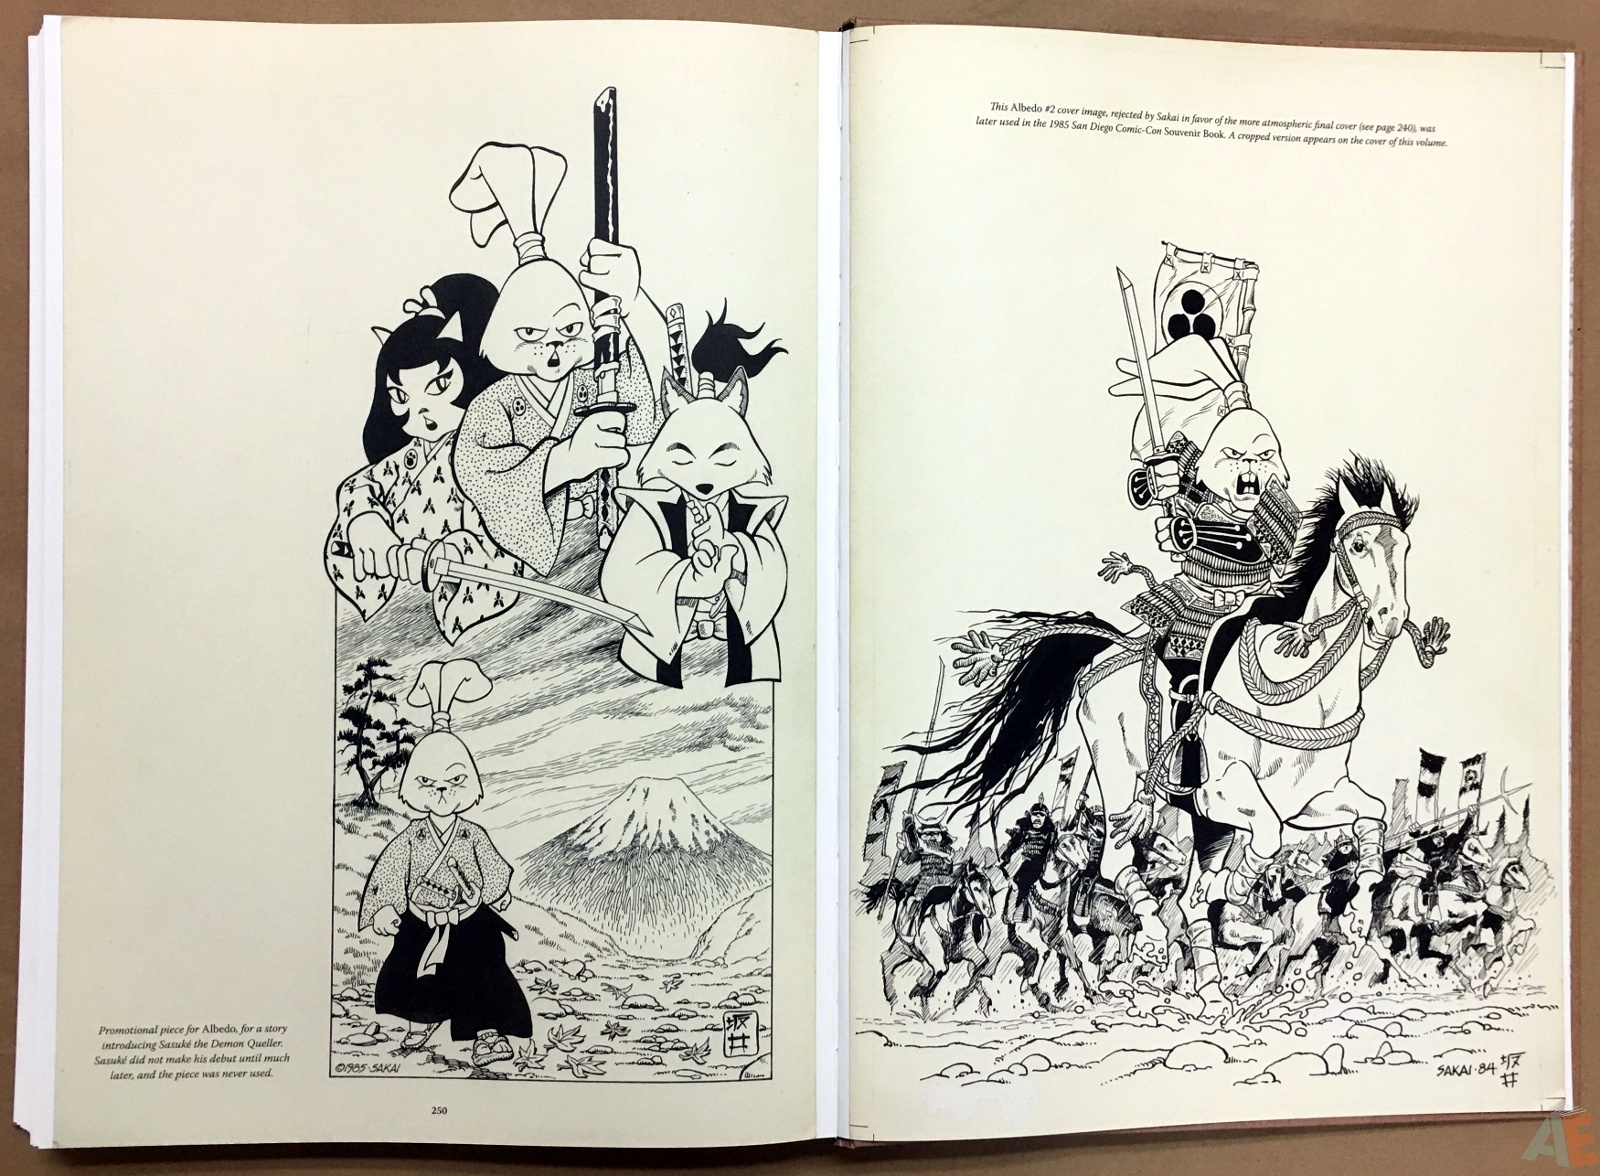 Usagi Yojimbo: Samurai and Other Stories Gallery Edition 48